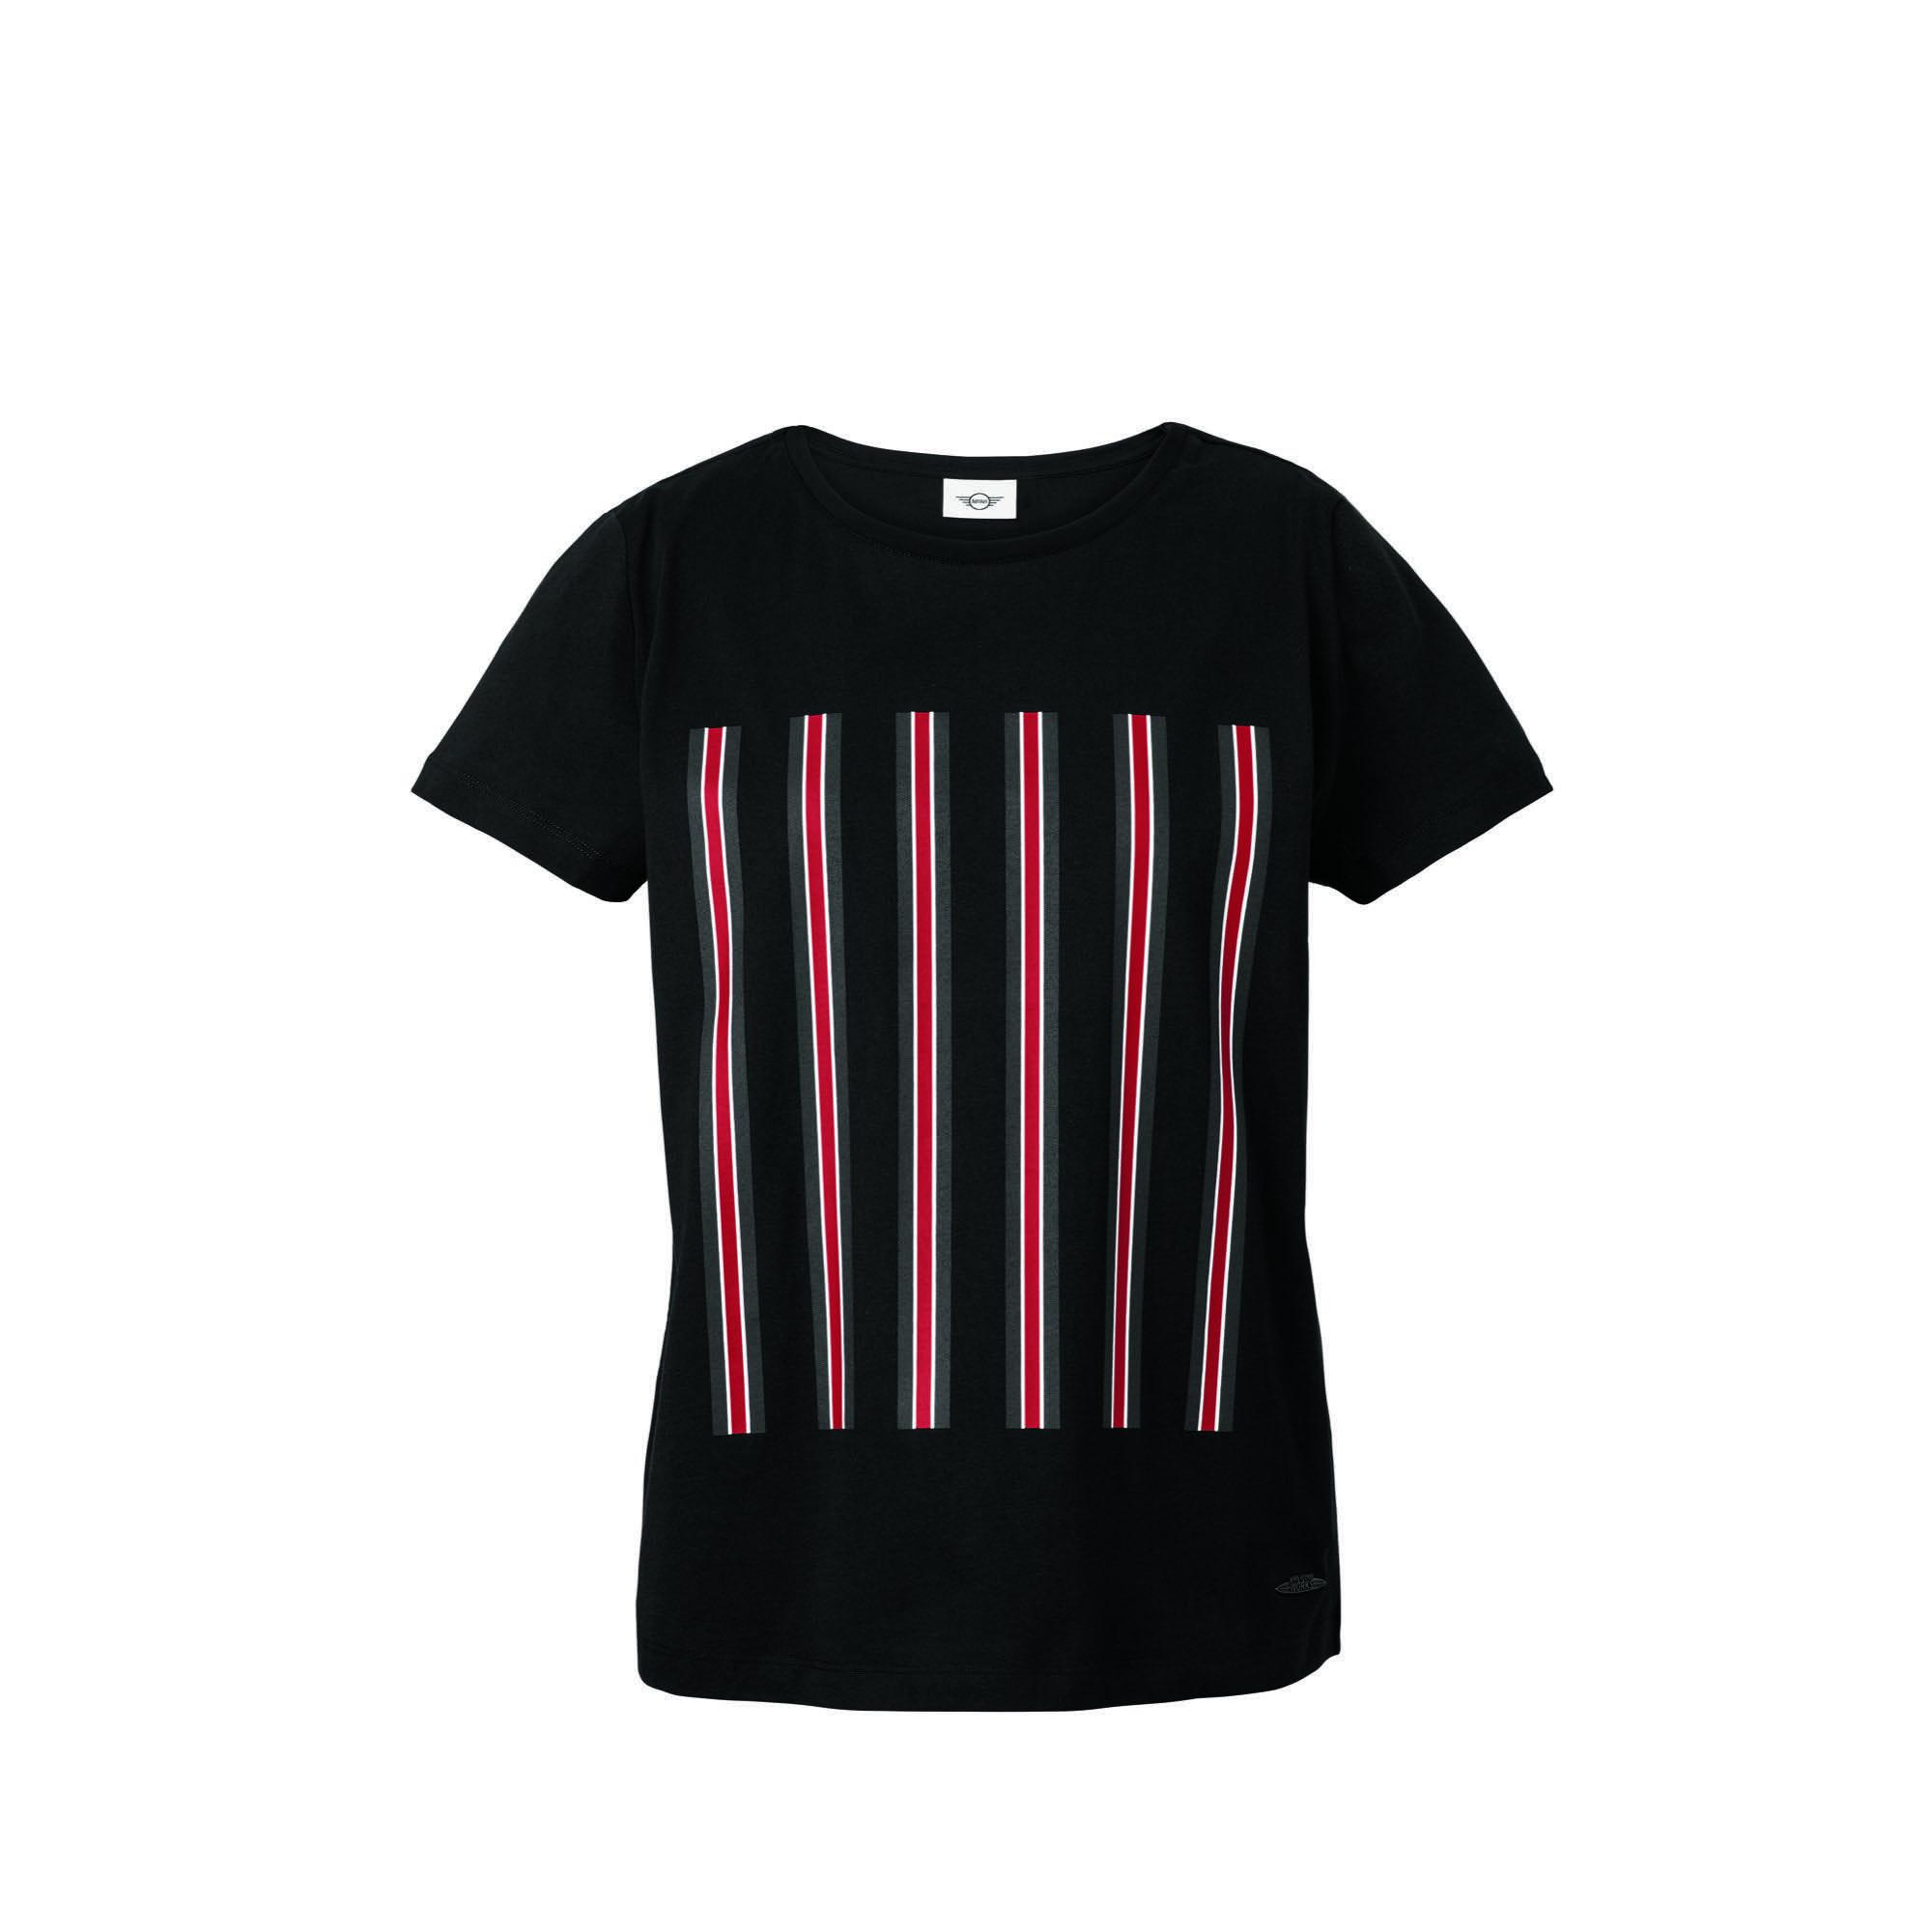 t shirt ray femme jcw noir dans mini lifestyle collection lifestyle mini john cooper works. Black Bedroom Furniture Sets. Home Design Ideas